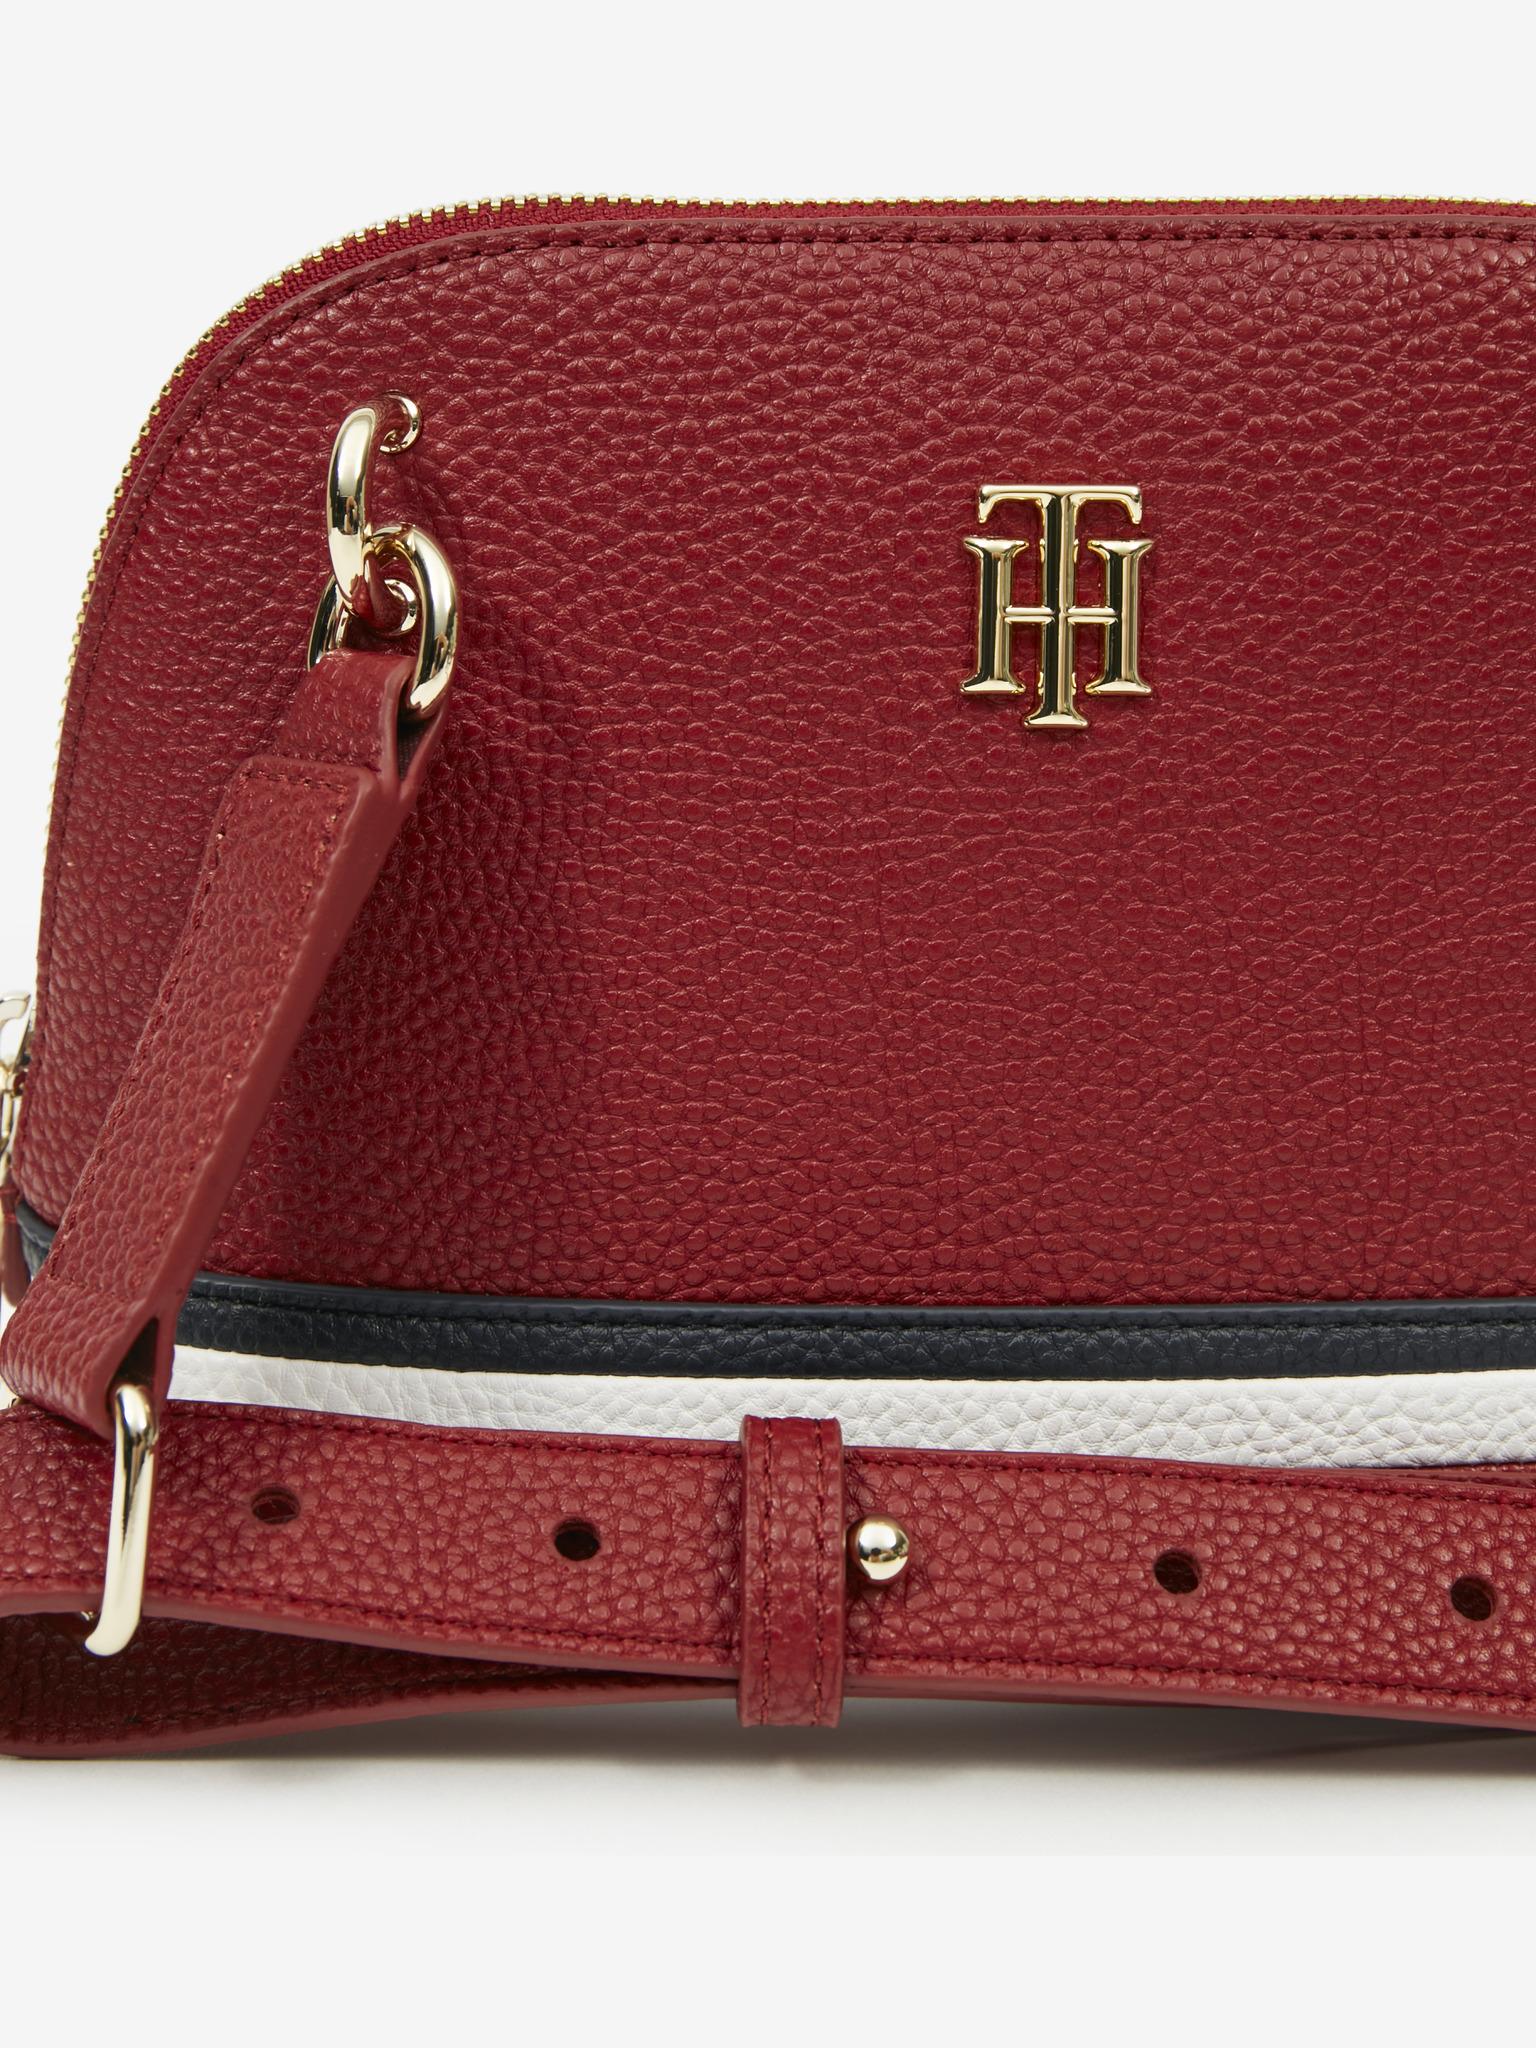 Tommy Hilfiger red crossbody handbag Element